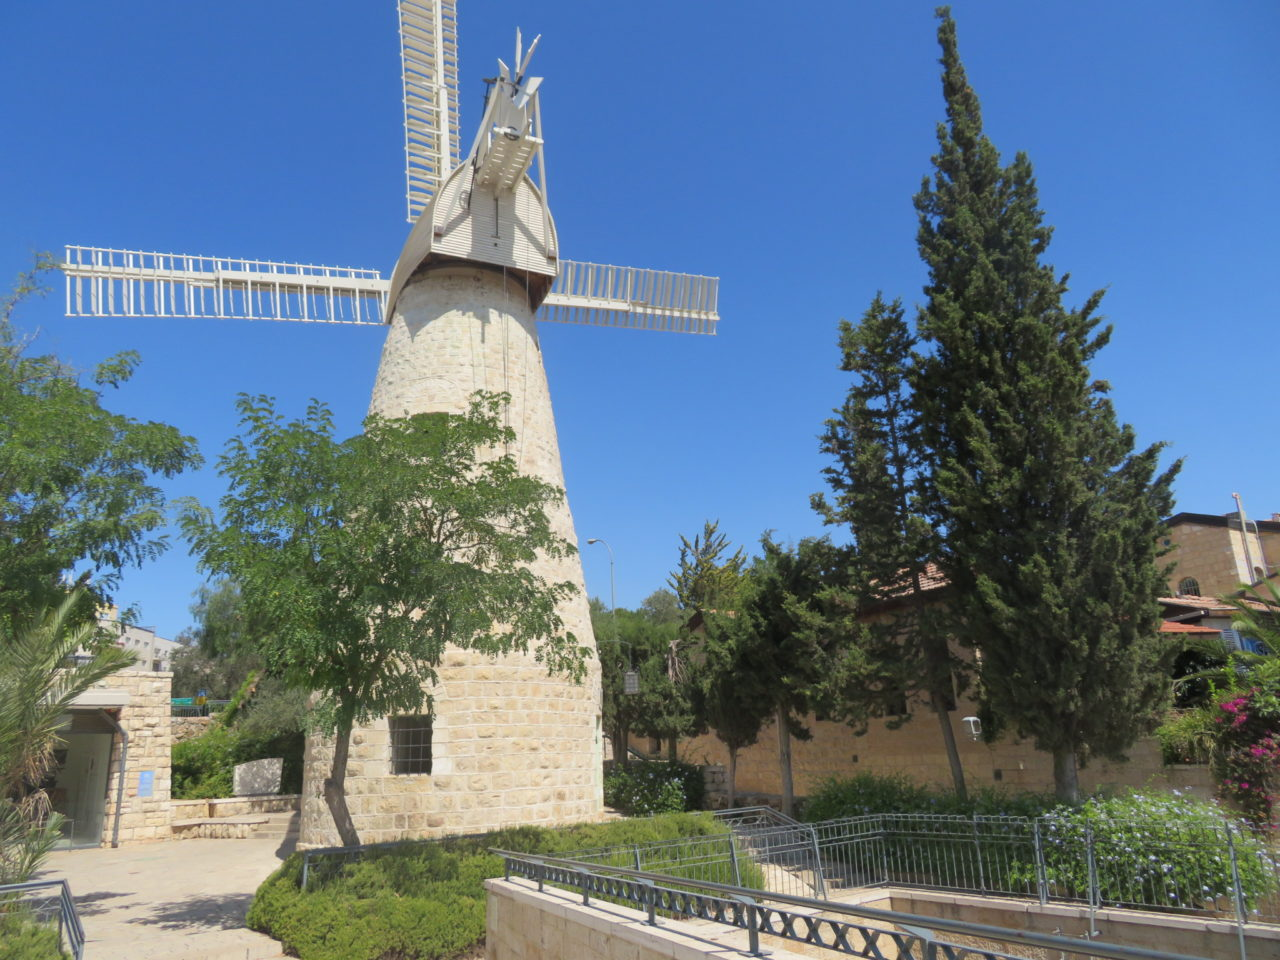 The joys of walking Jerusalem - The windmill in the Yomin Moshe neighborhood